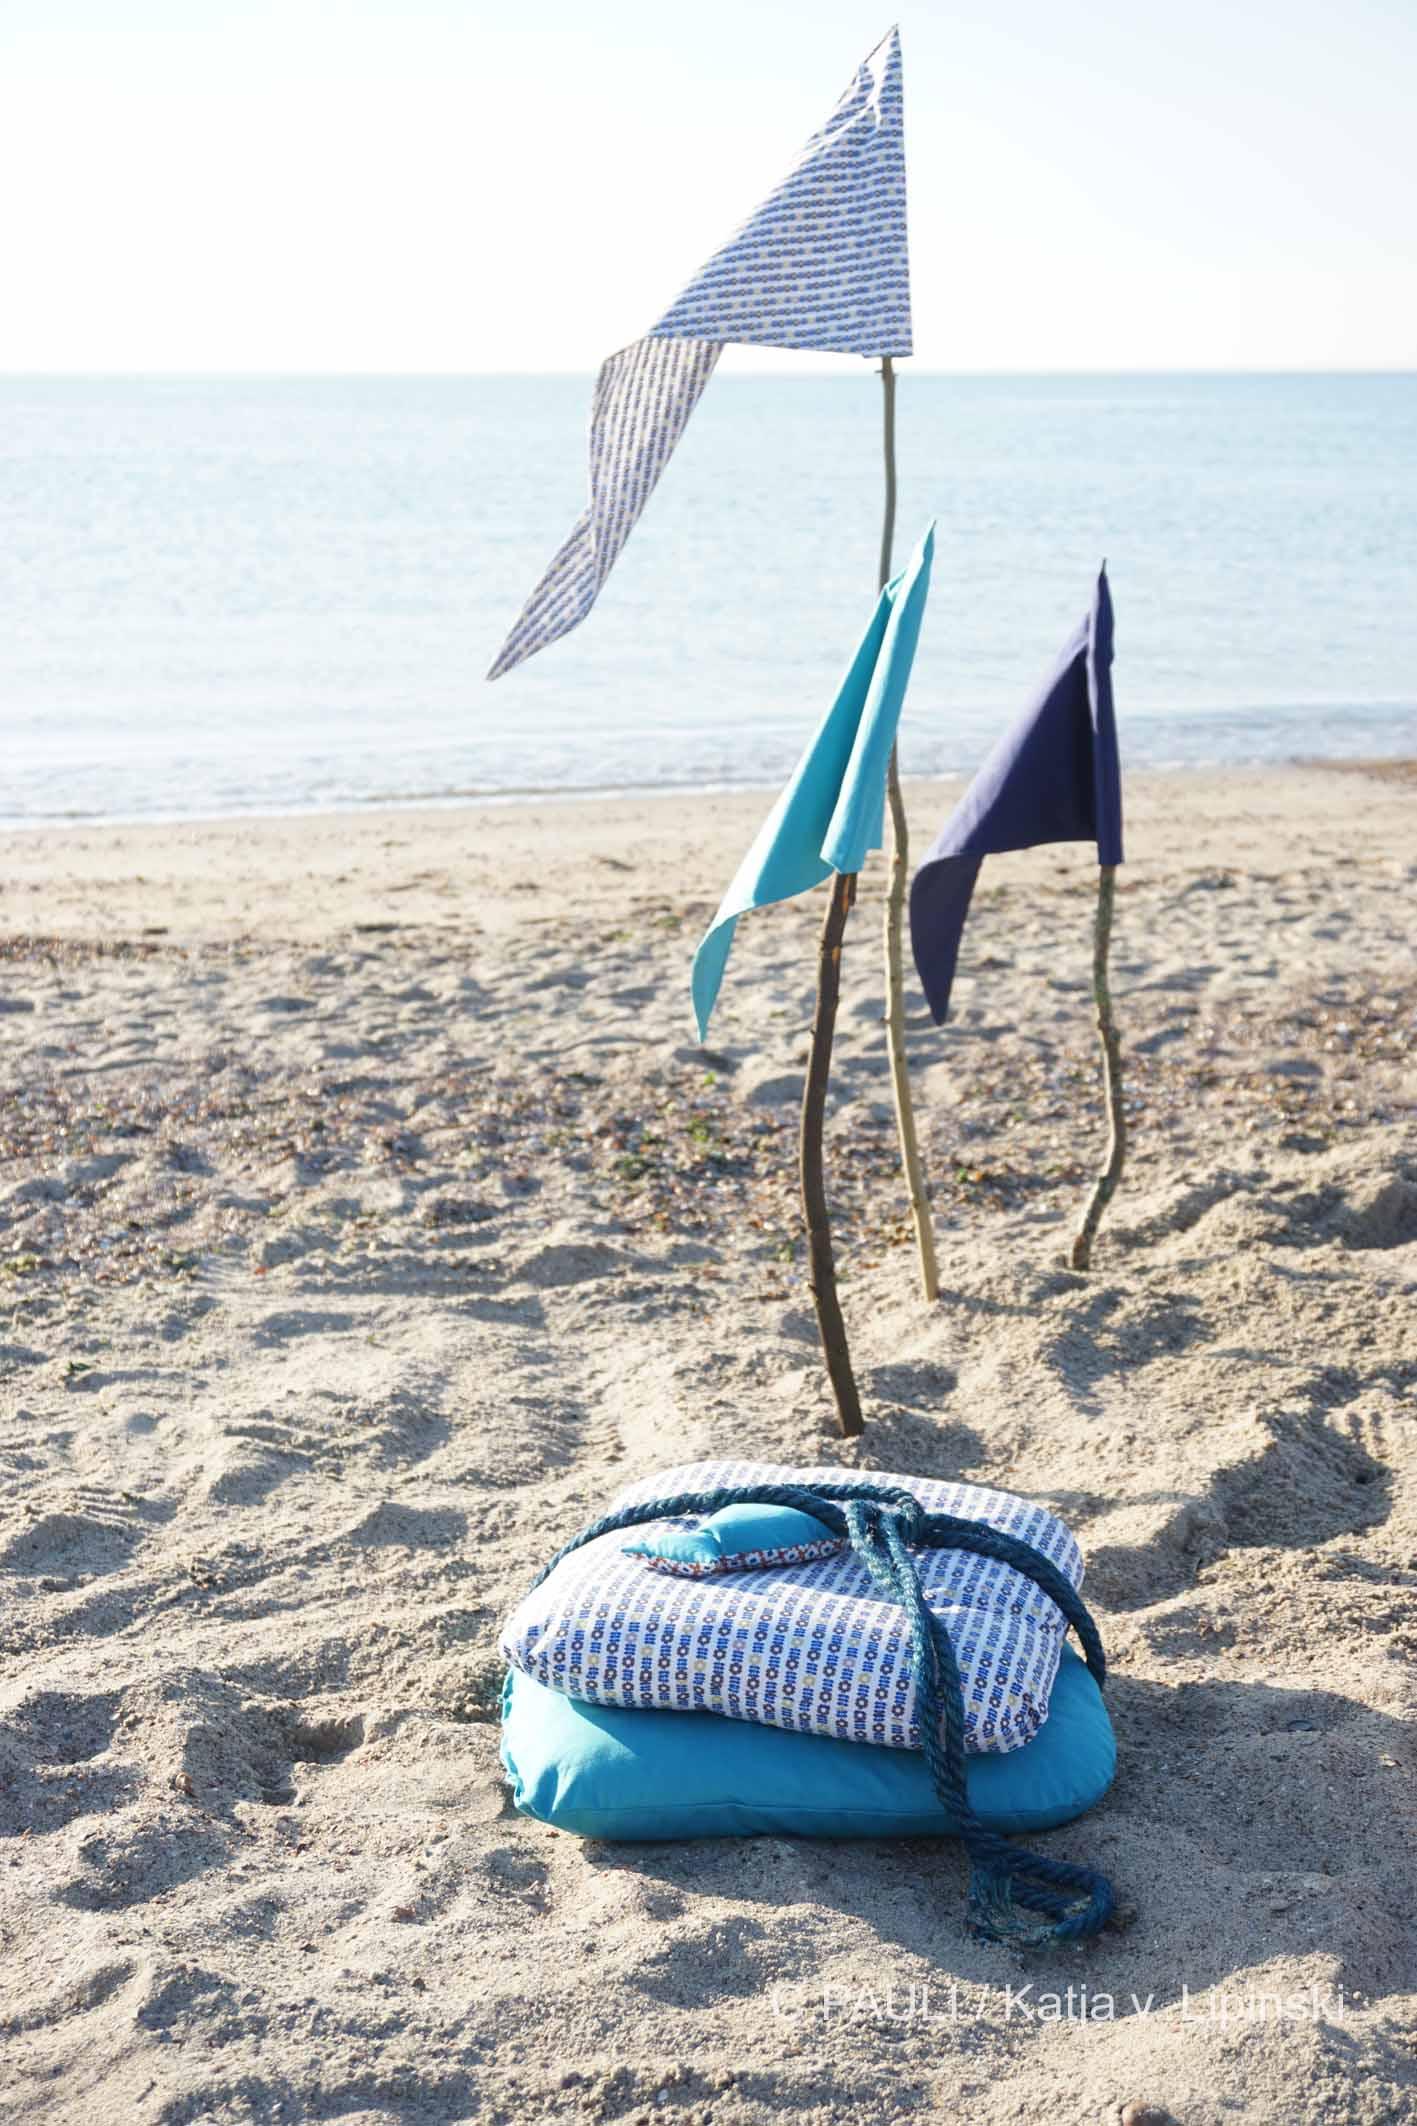 Frisch Genähtes vom Meer | C.Pauli Nature Blog